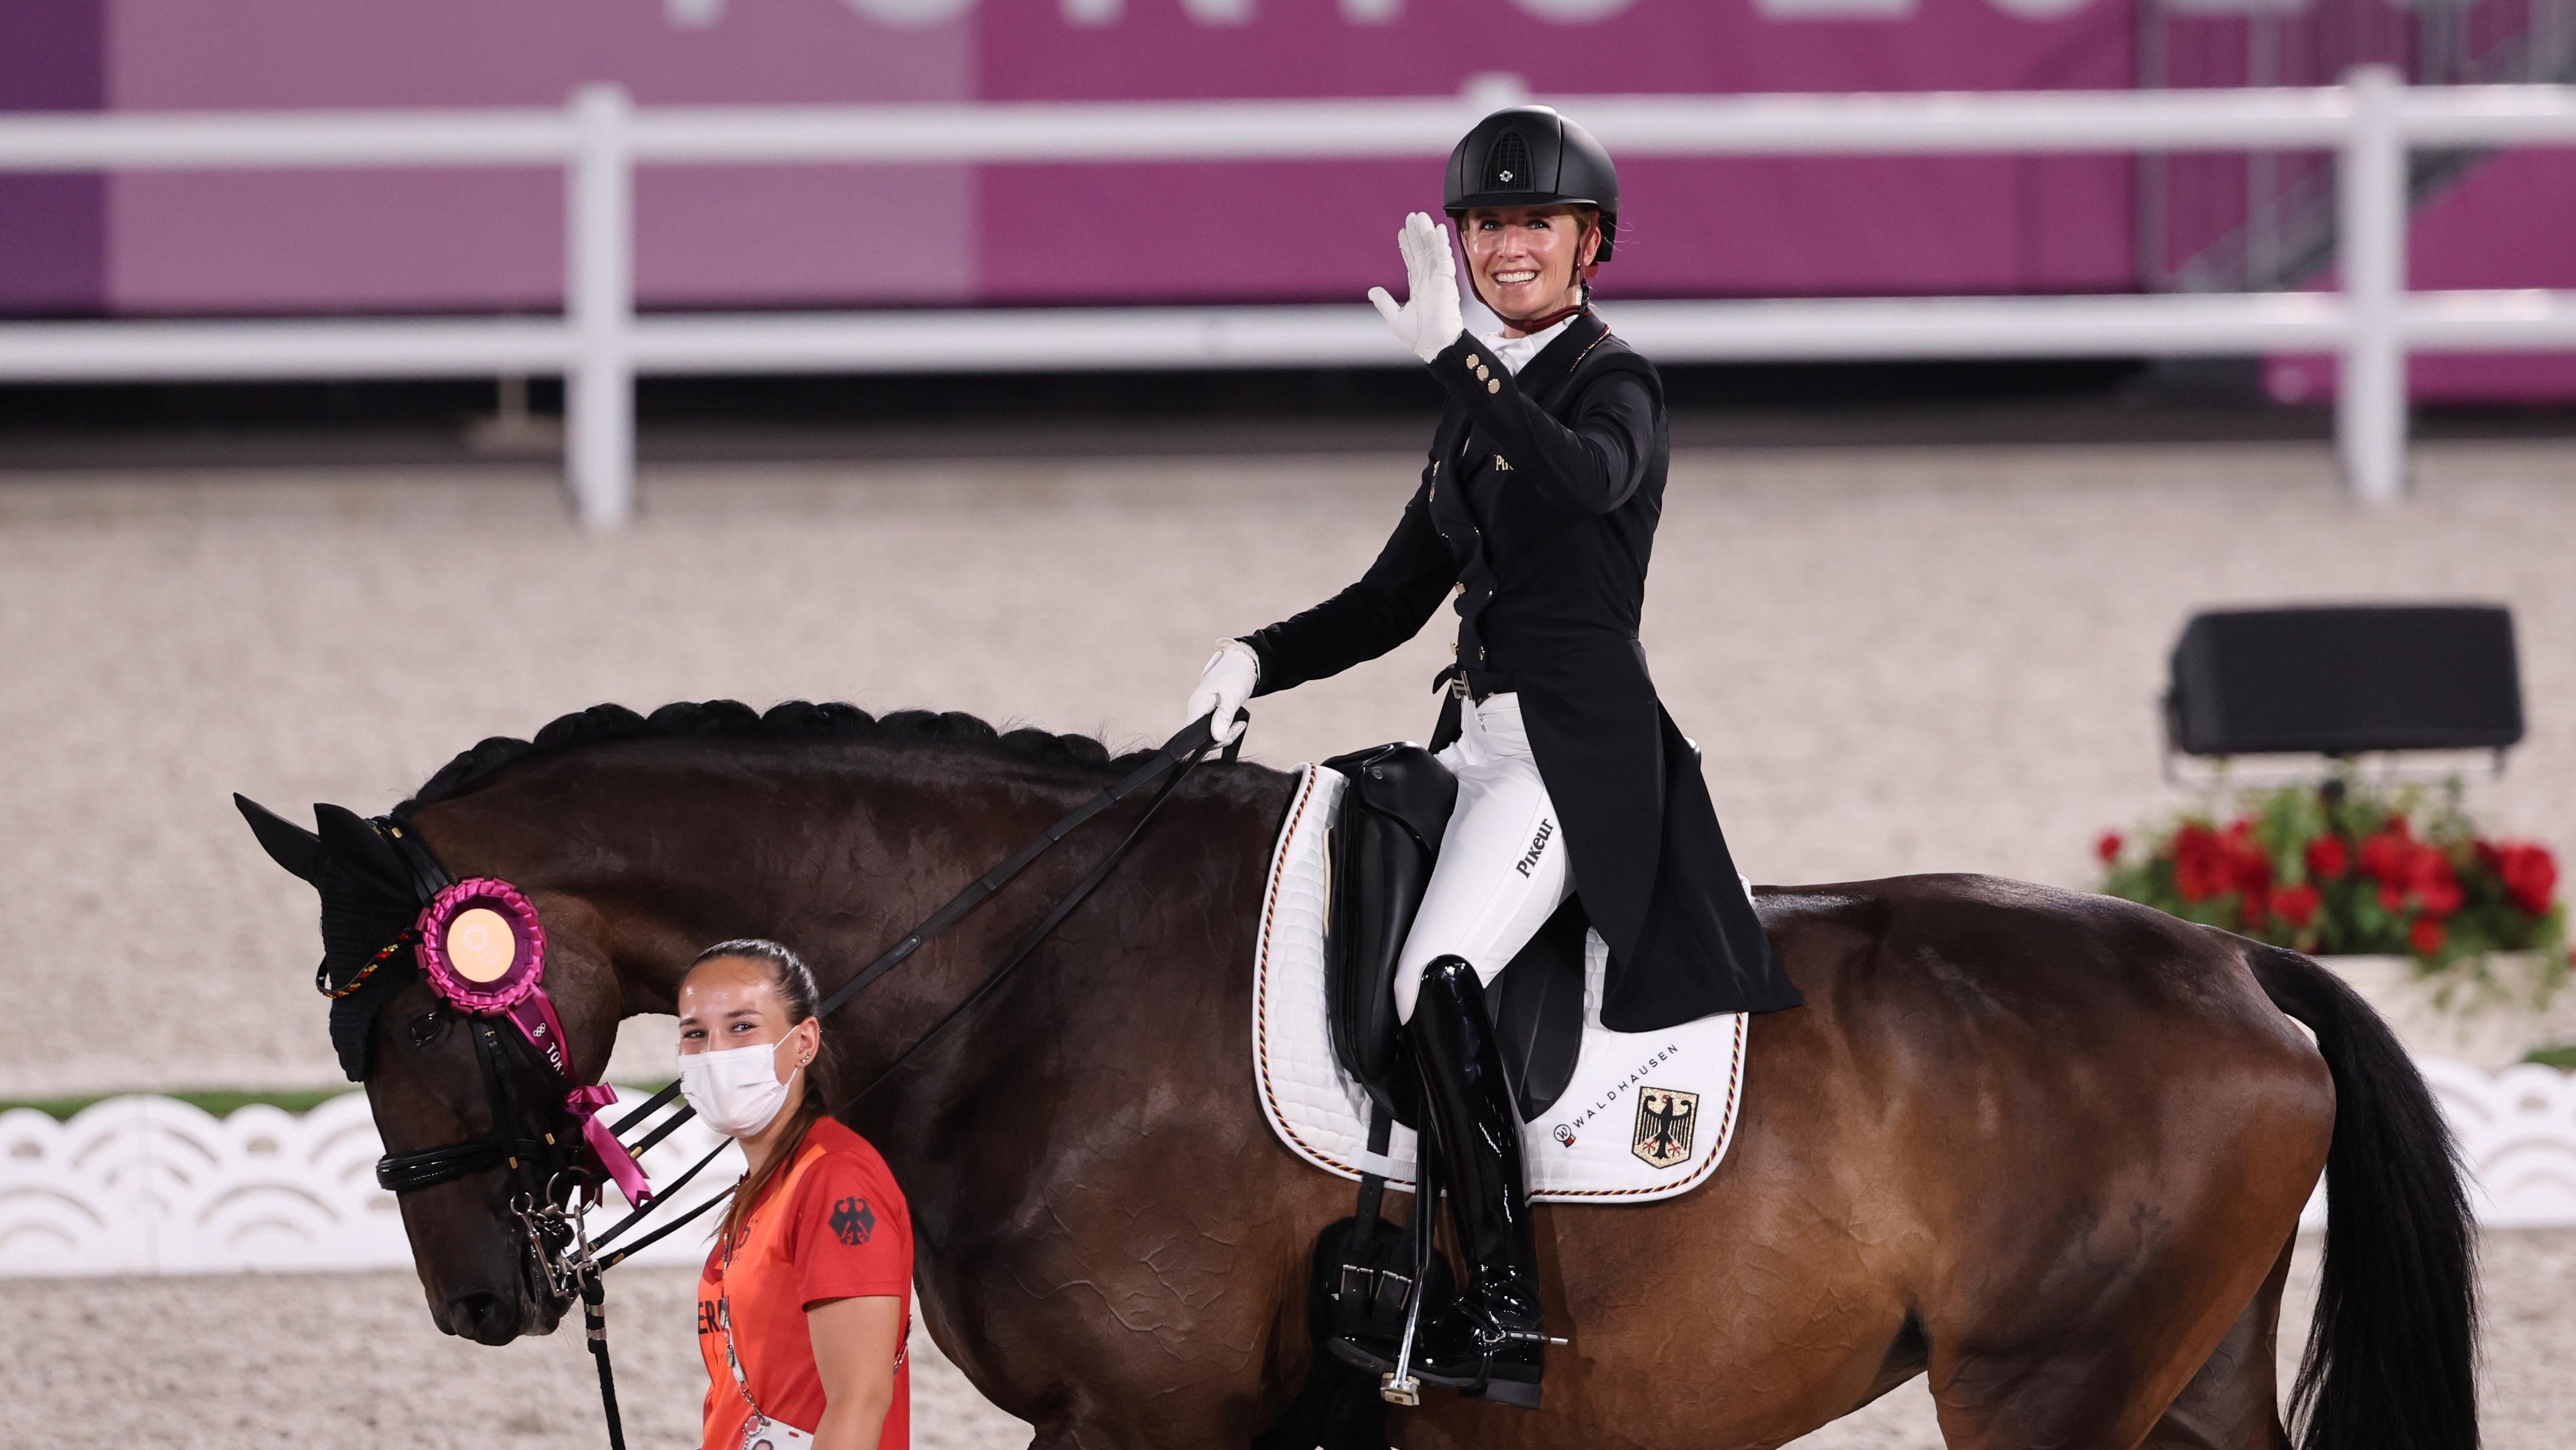 Tokyo 2020 Olympics - Equestrian - Dressage - Team - Medal Ceremony - Equestrian Park - Tokyo, Japan - July 27, 2021. Jessica von Bredow-Werndl of Germany on her horse Dalera after winning the gold medal REUTERS/Alkis Konstantinidis